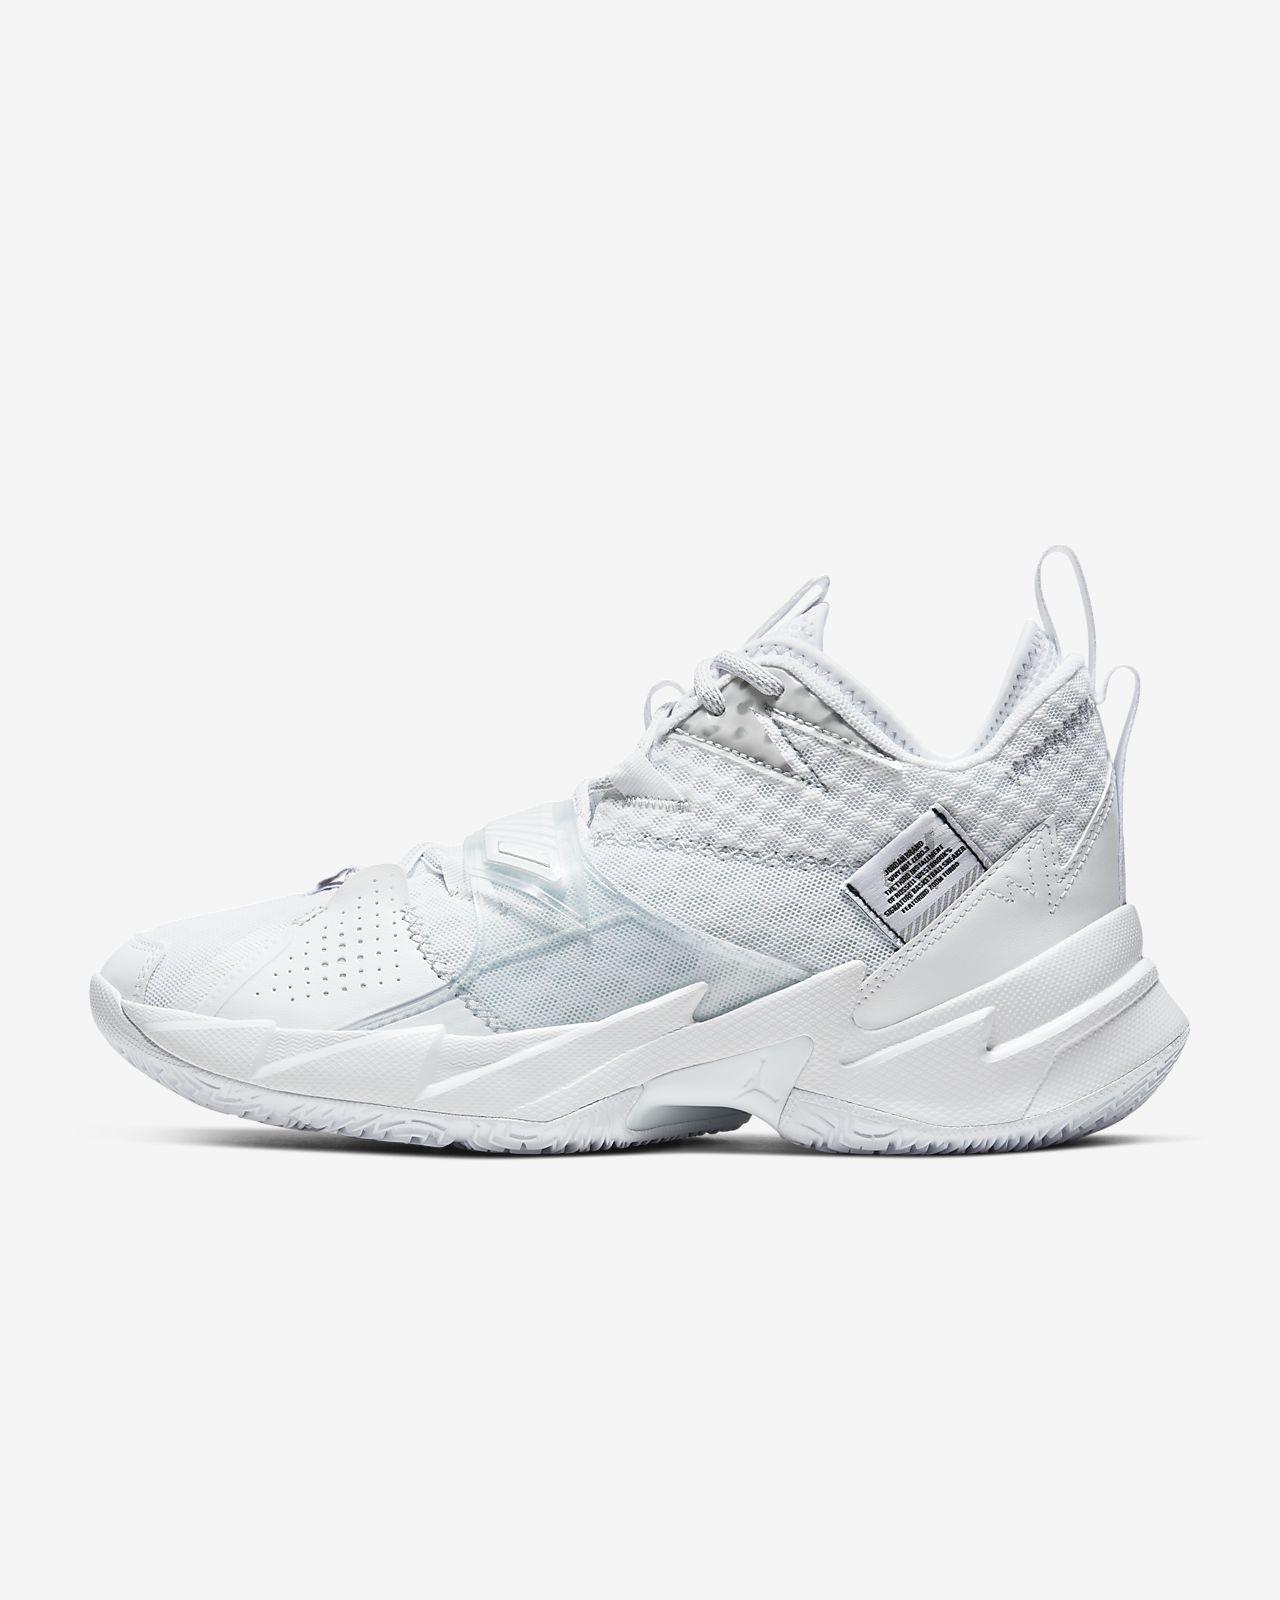 Jordan Why Not Zer0.3 PF 男子篮球鞋